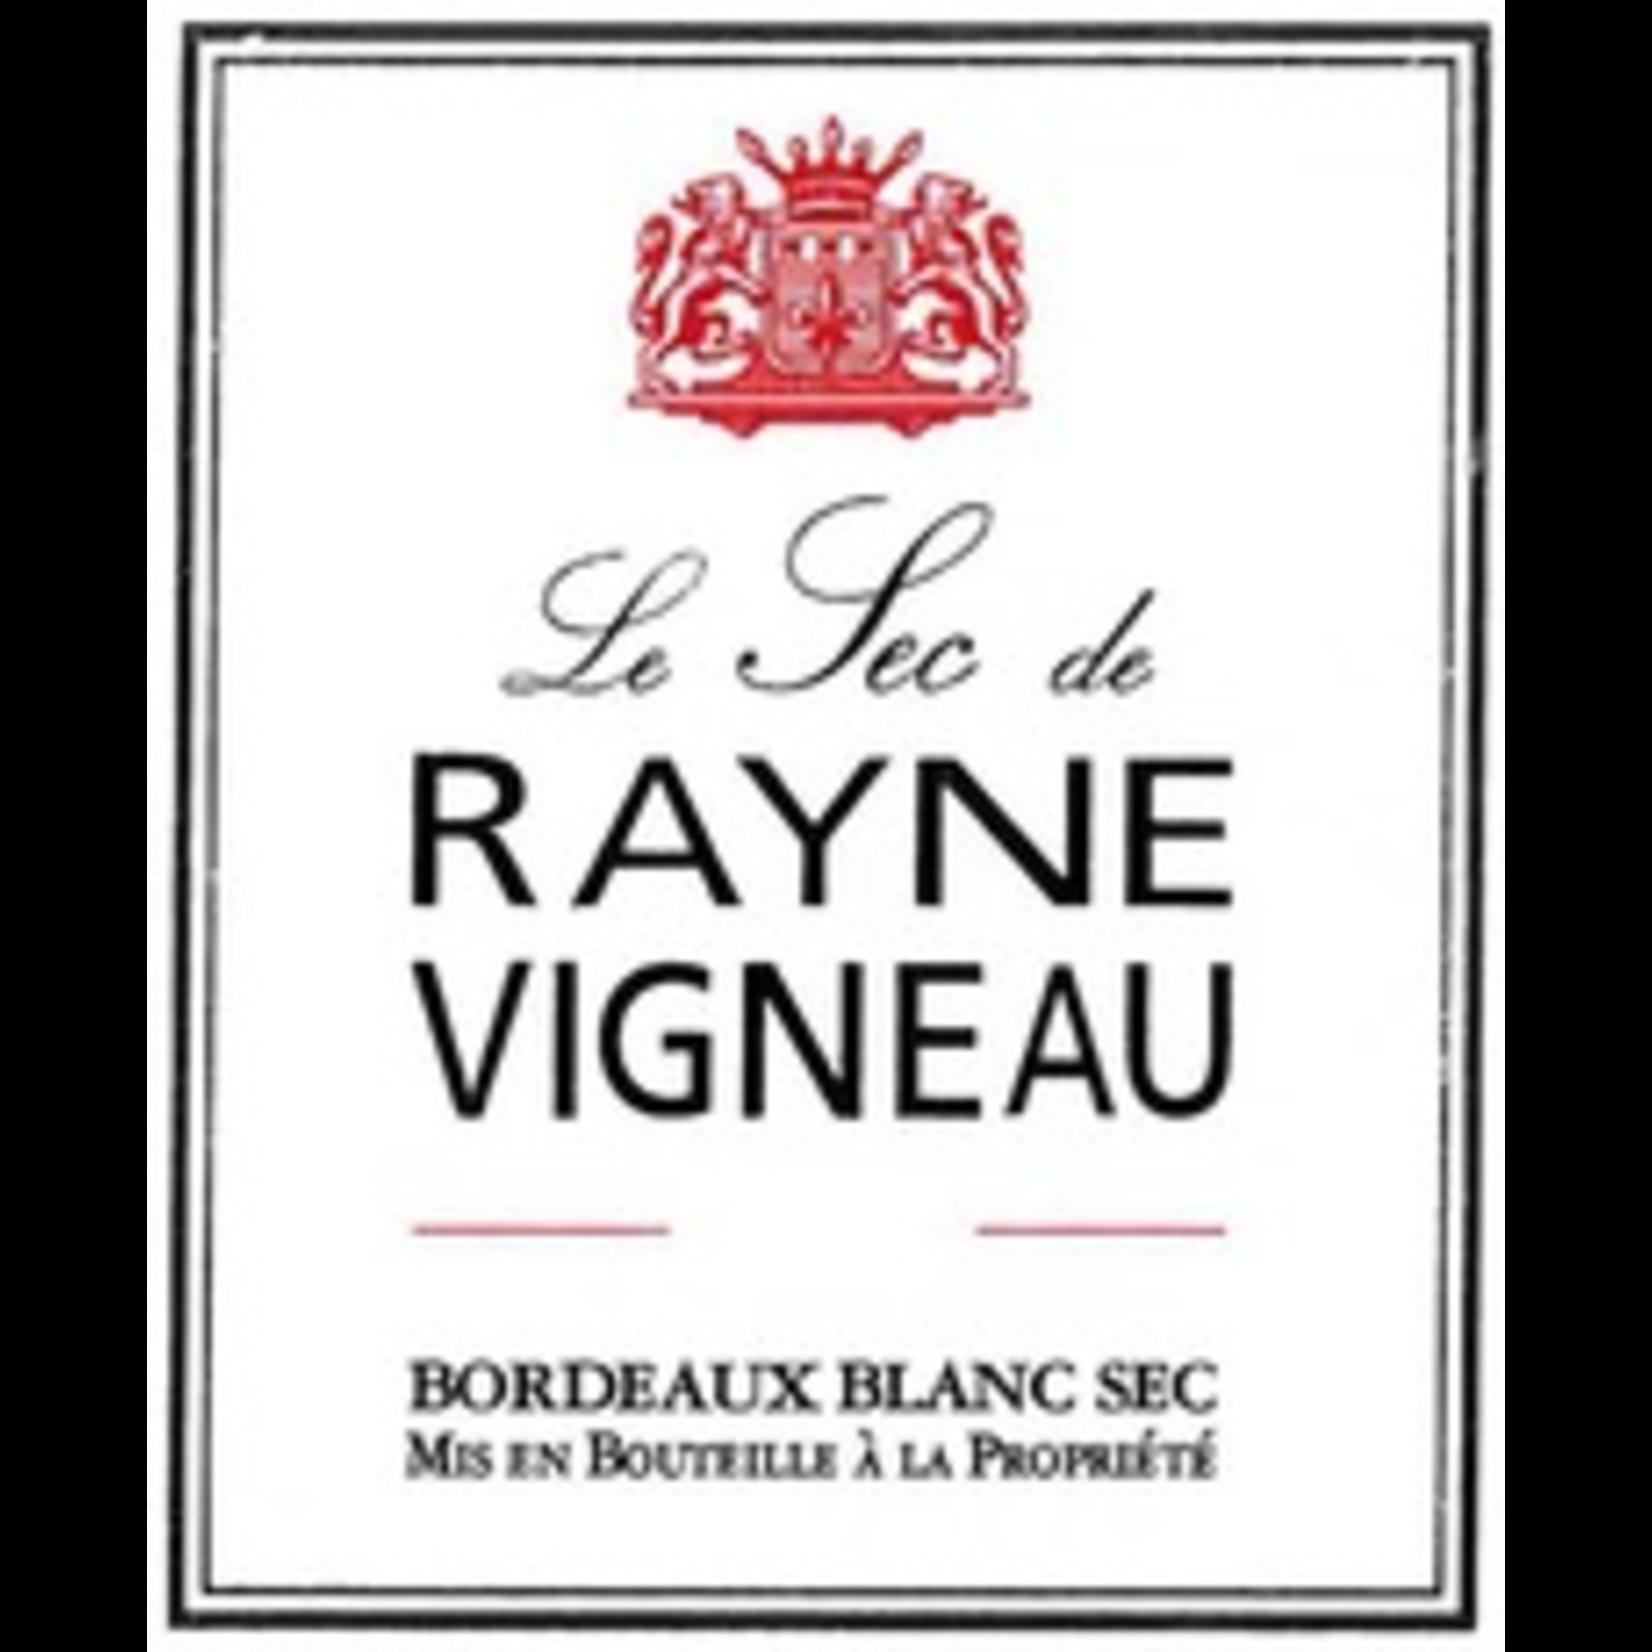 Chateau de Rayne Vigneau Le Sec de Rayne Vigneau 2018